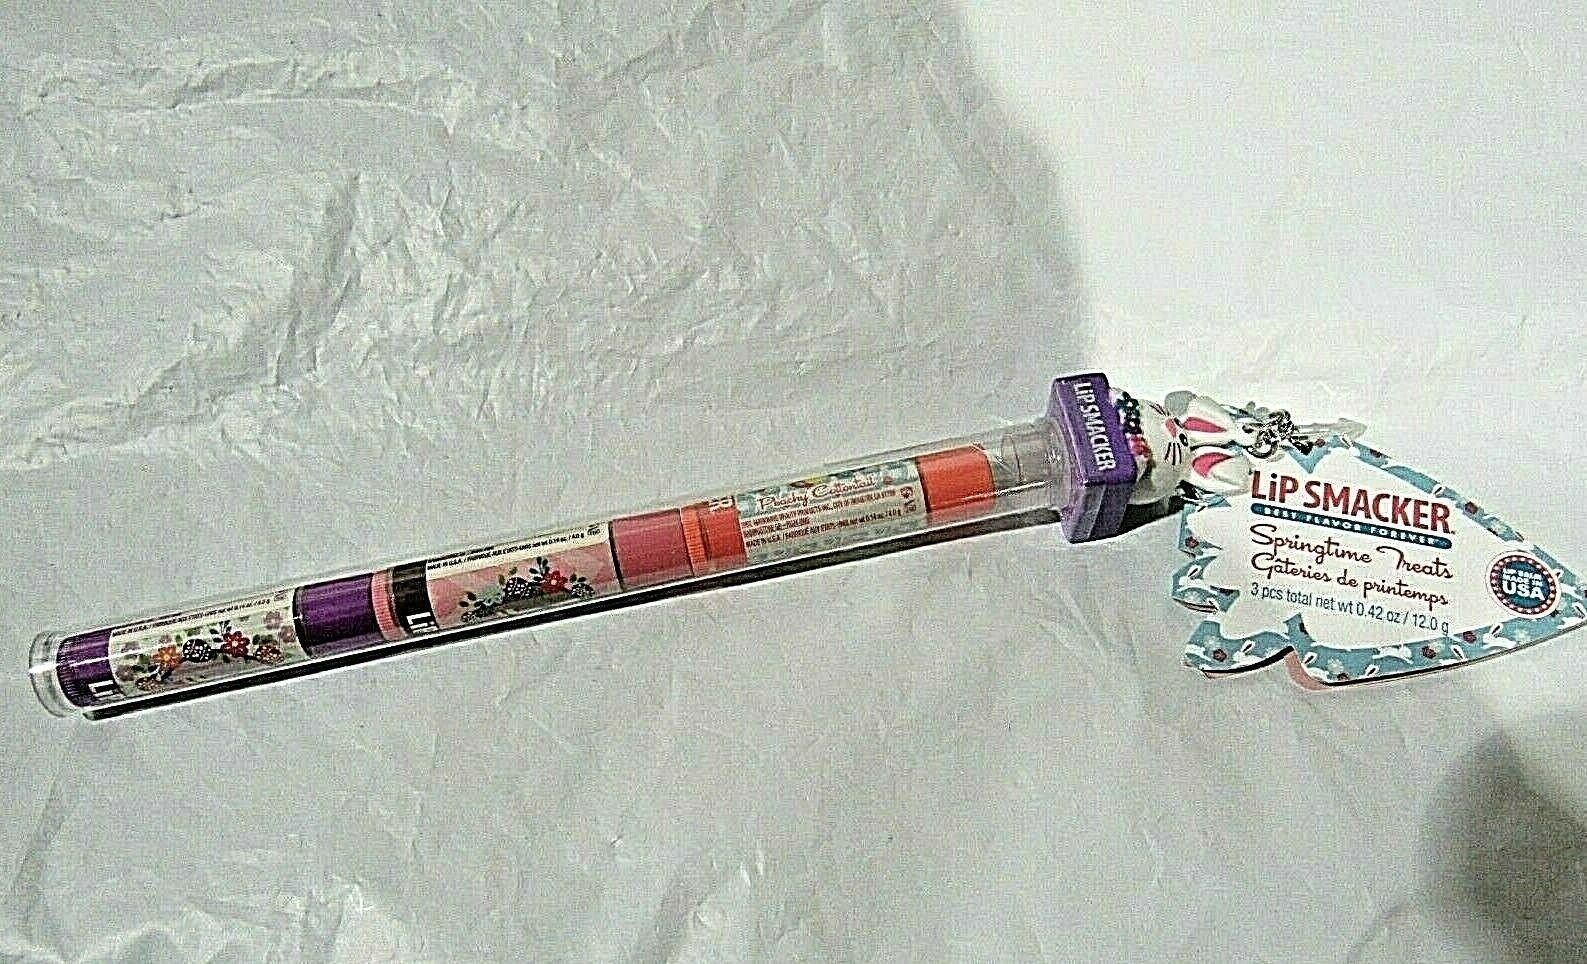 Lip Smacker Bunny Trio Balm Peachy Cottontail Chocolate Grape Jelly net wt.42oz - $17.99